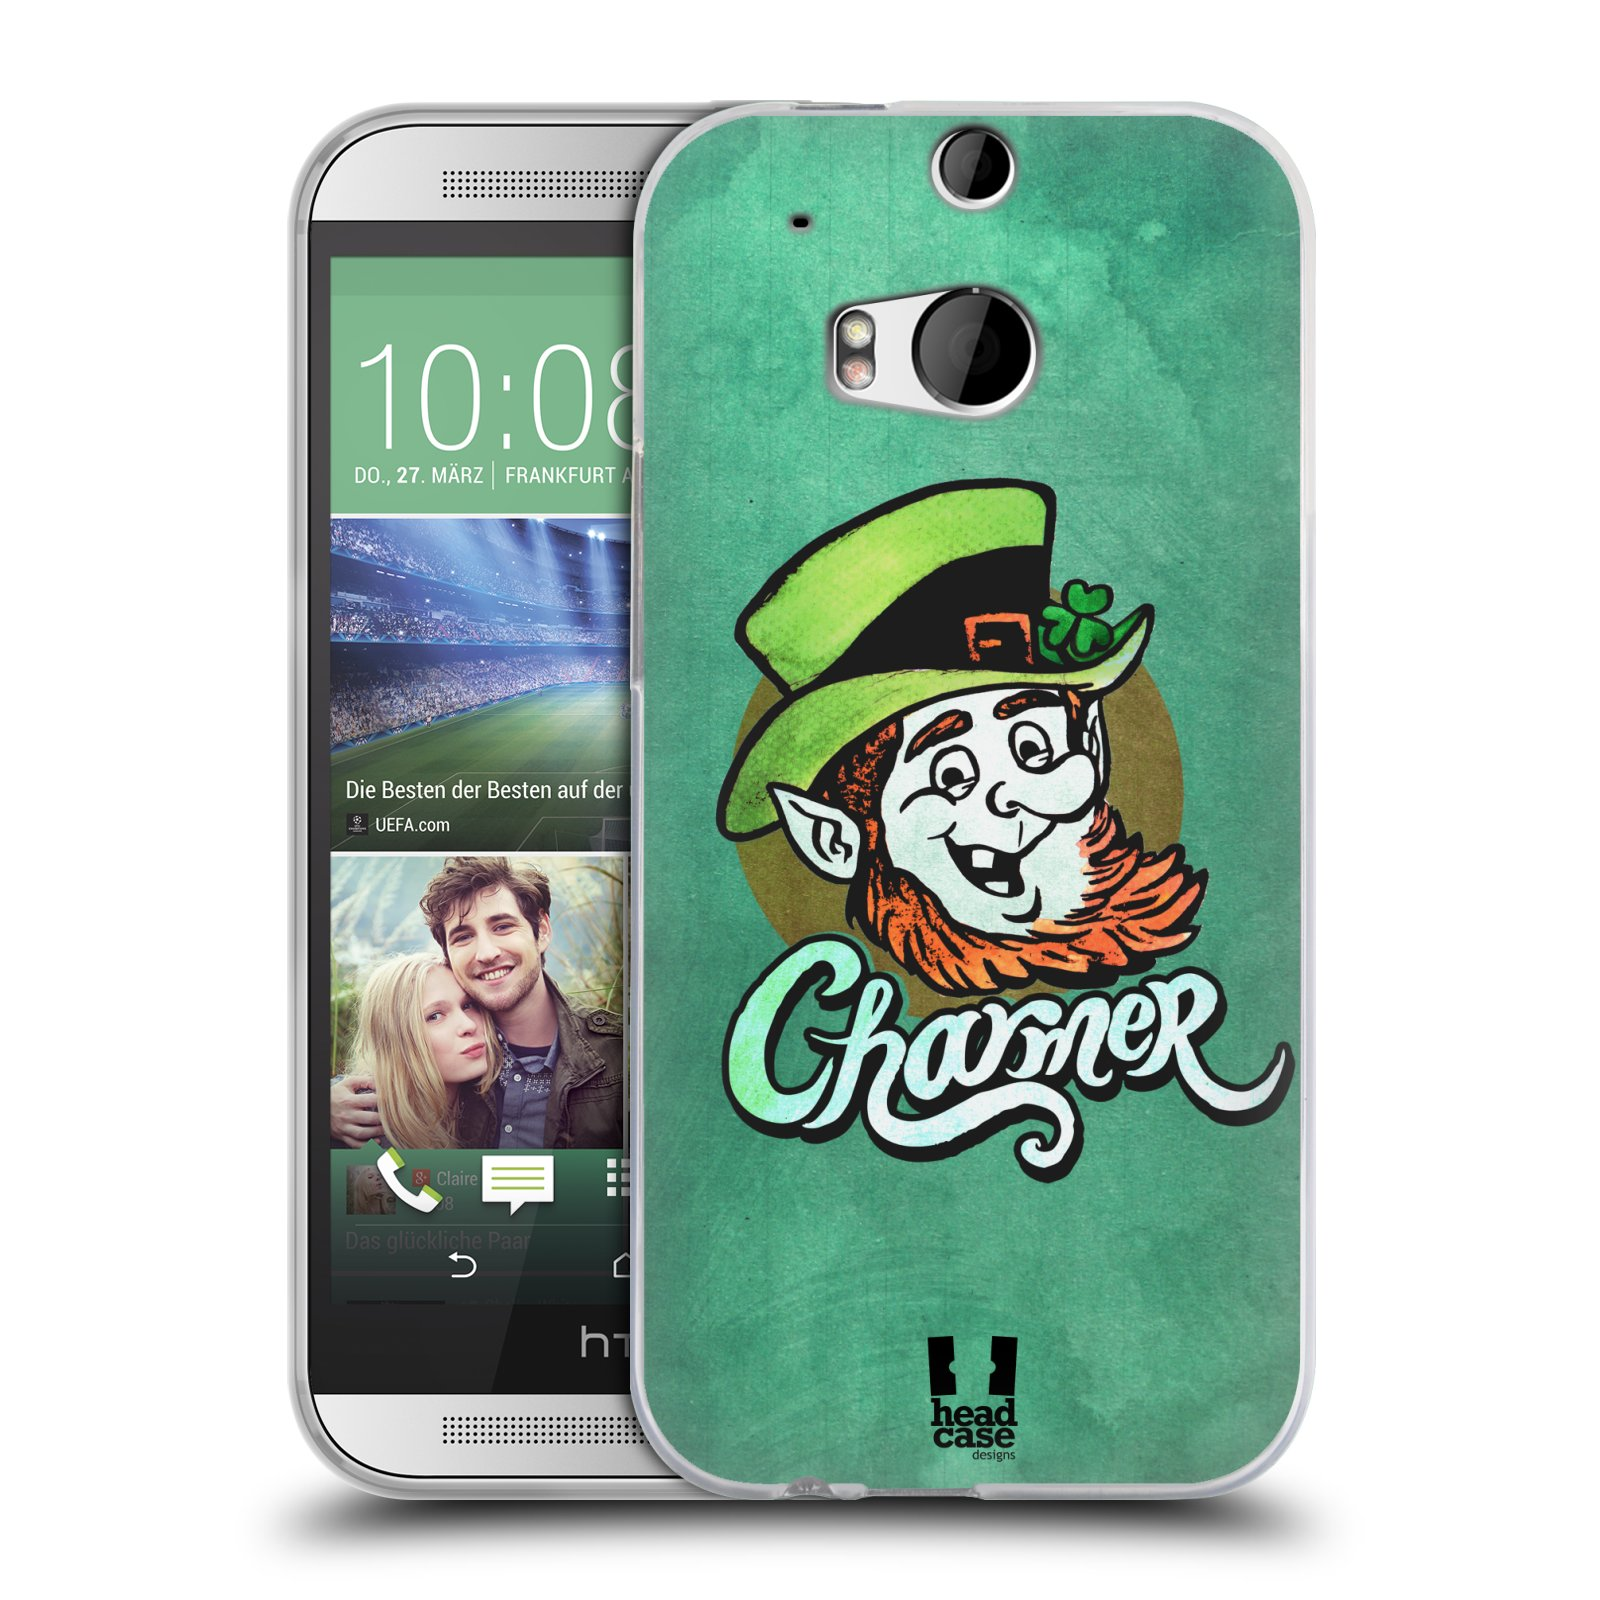 Silikonové pouzdro na mobil HTC ONE M8 HEAD CASE CHARMER (Silikonový kryt či obal na mobilní telefon HTC ONE M8)